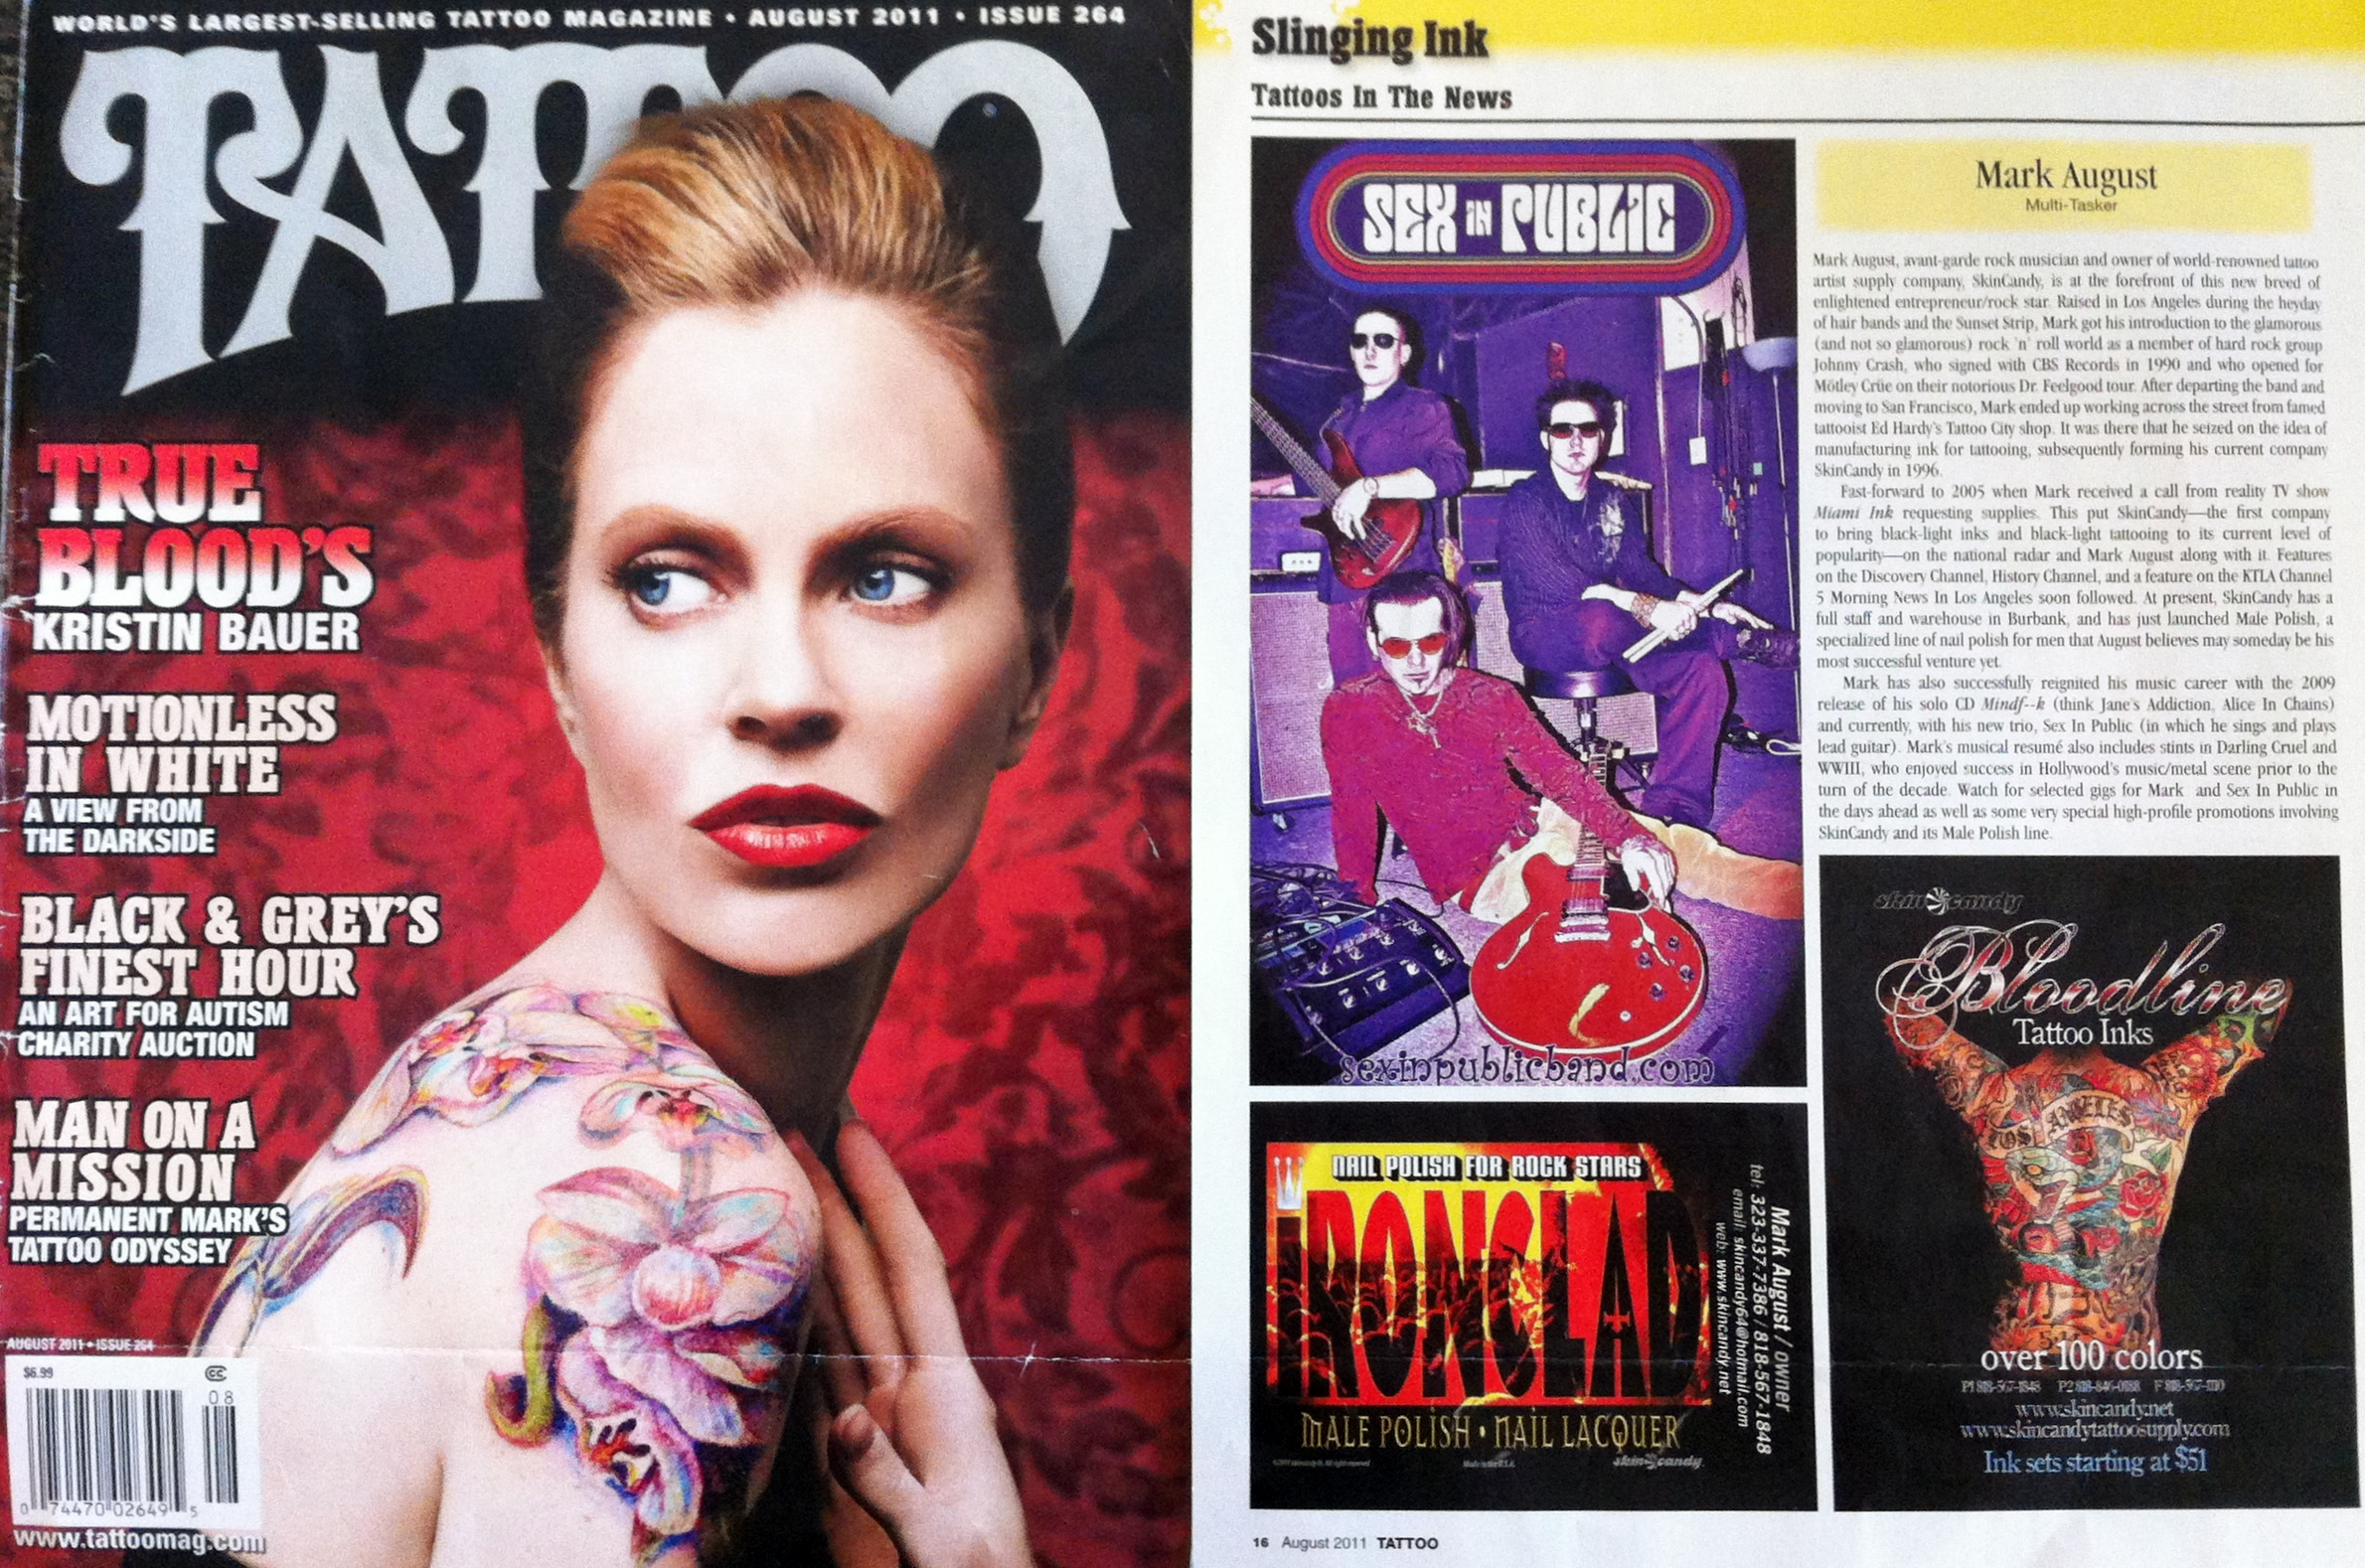 August 2011 Tattoo Magazine - SEX IN PUBLIC